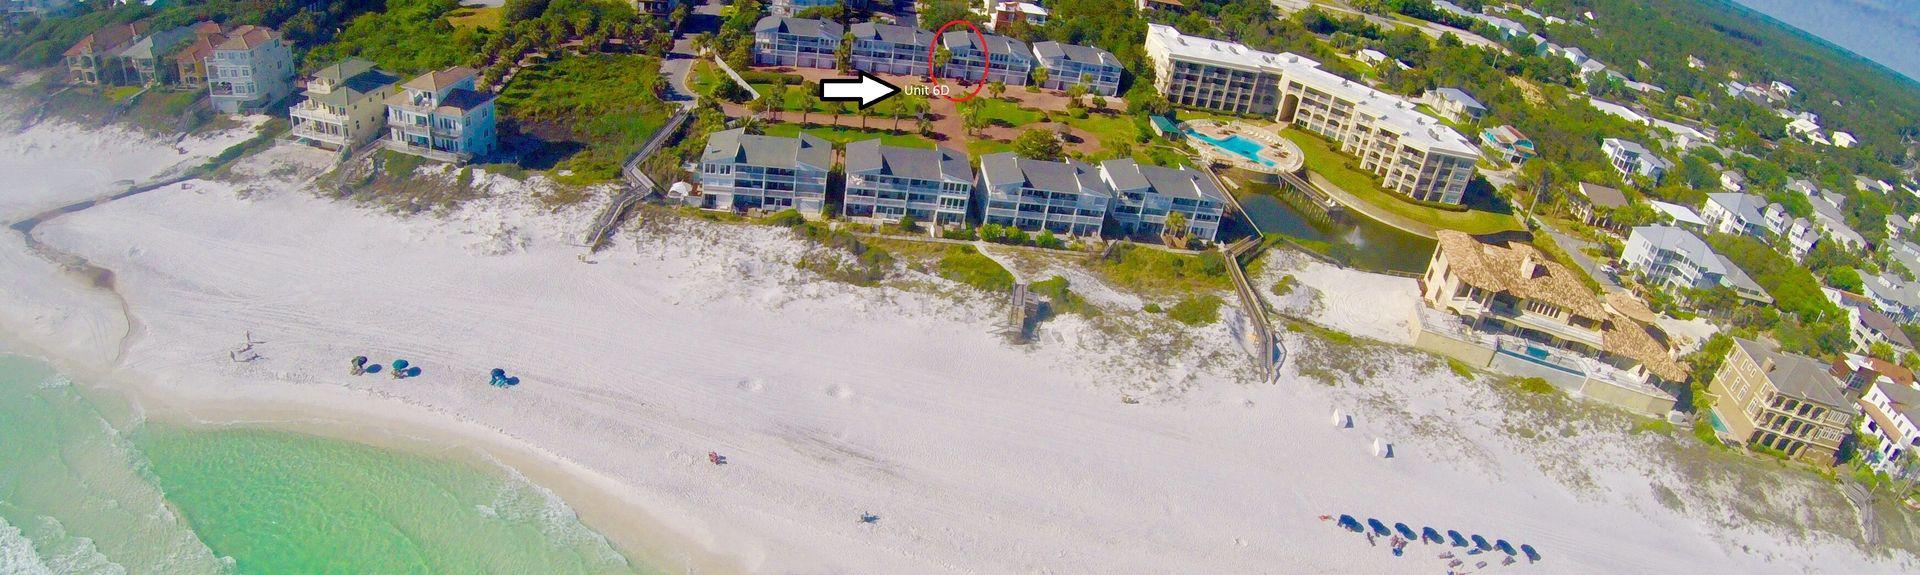 Sea Haunts (Santa Rosa Beach, Florida, United States)